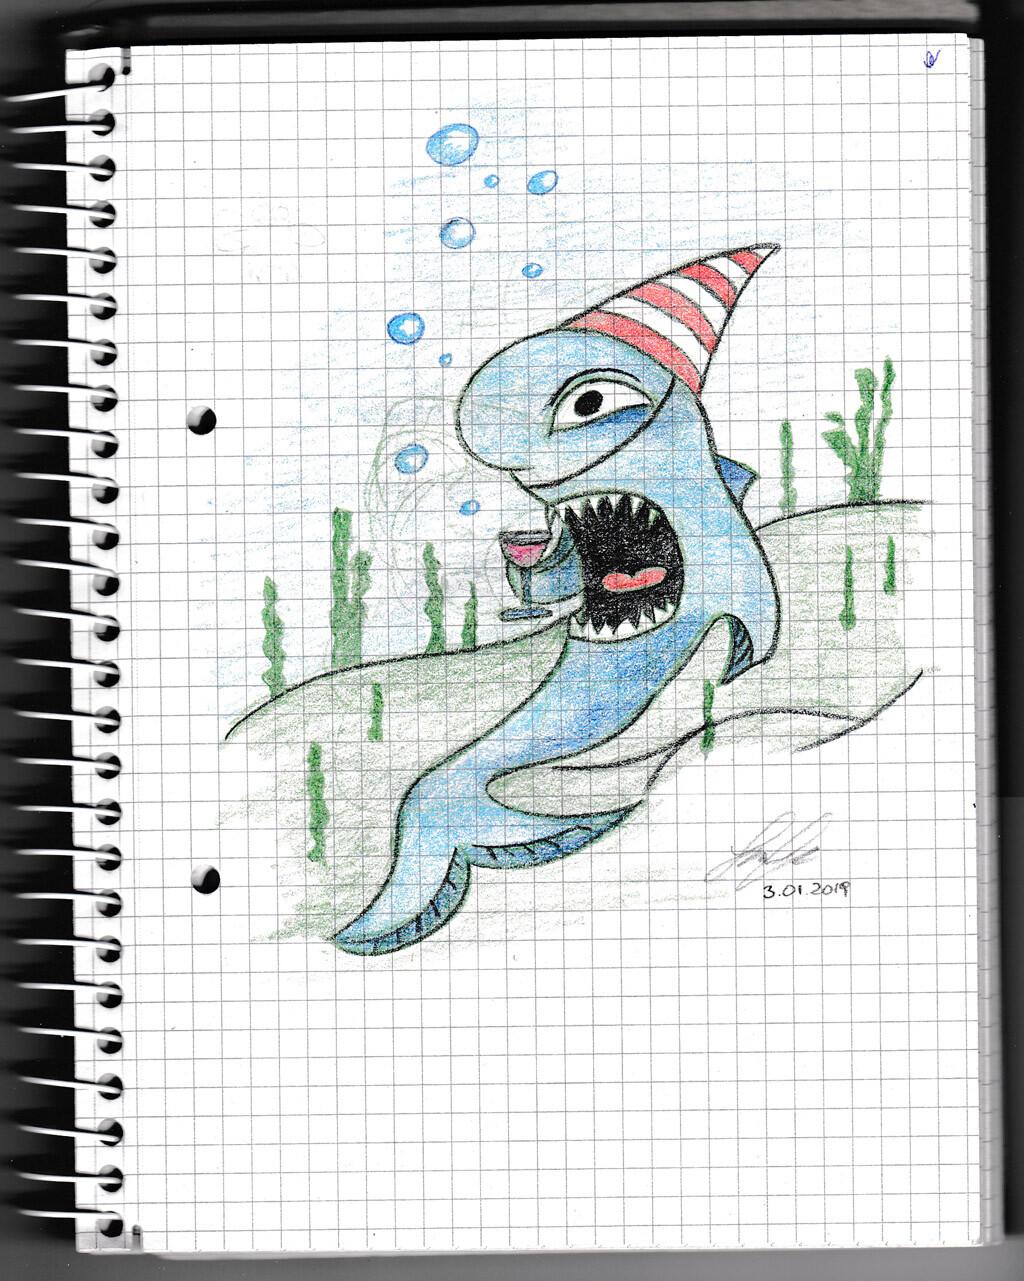 character, sketch, pencil, monster, creature, shark